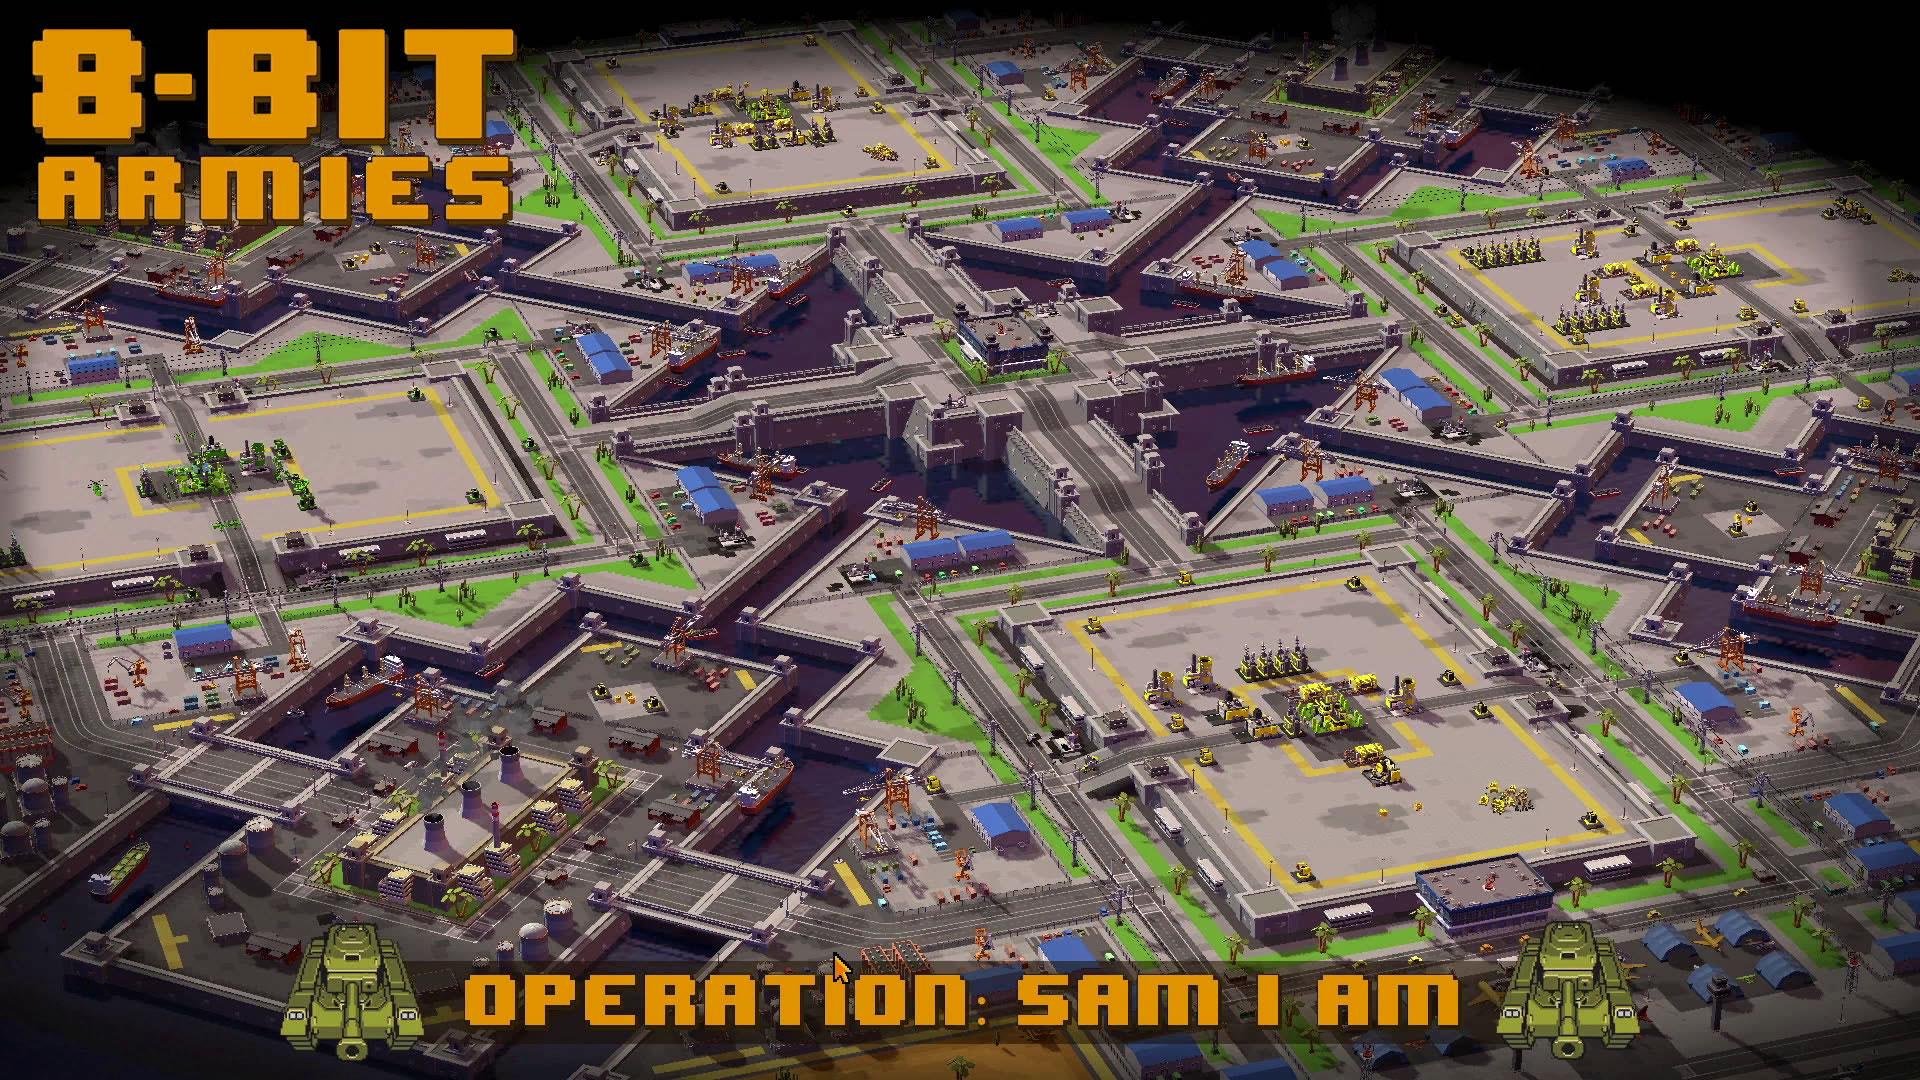 8-Bit Armies – Let's Play: BETA Singleplayer Mission 6 – SAM I AM